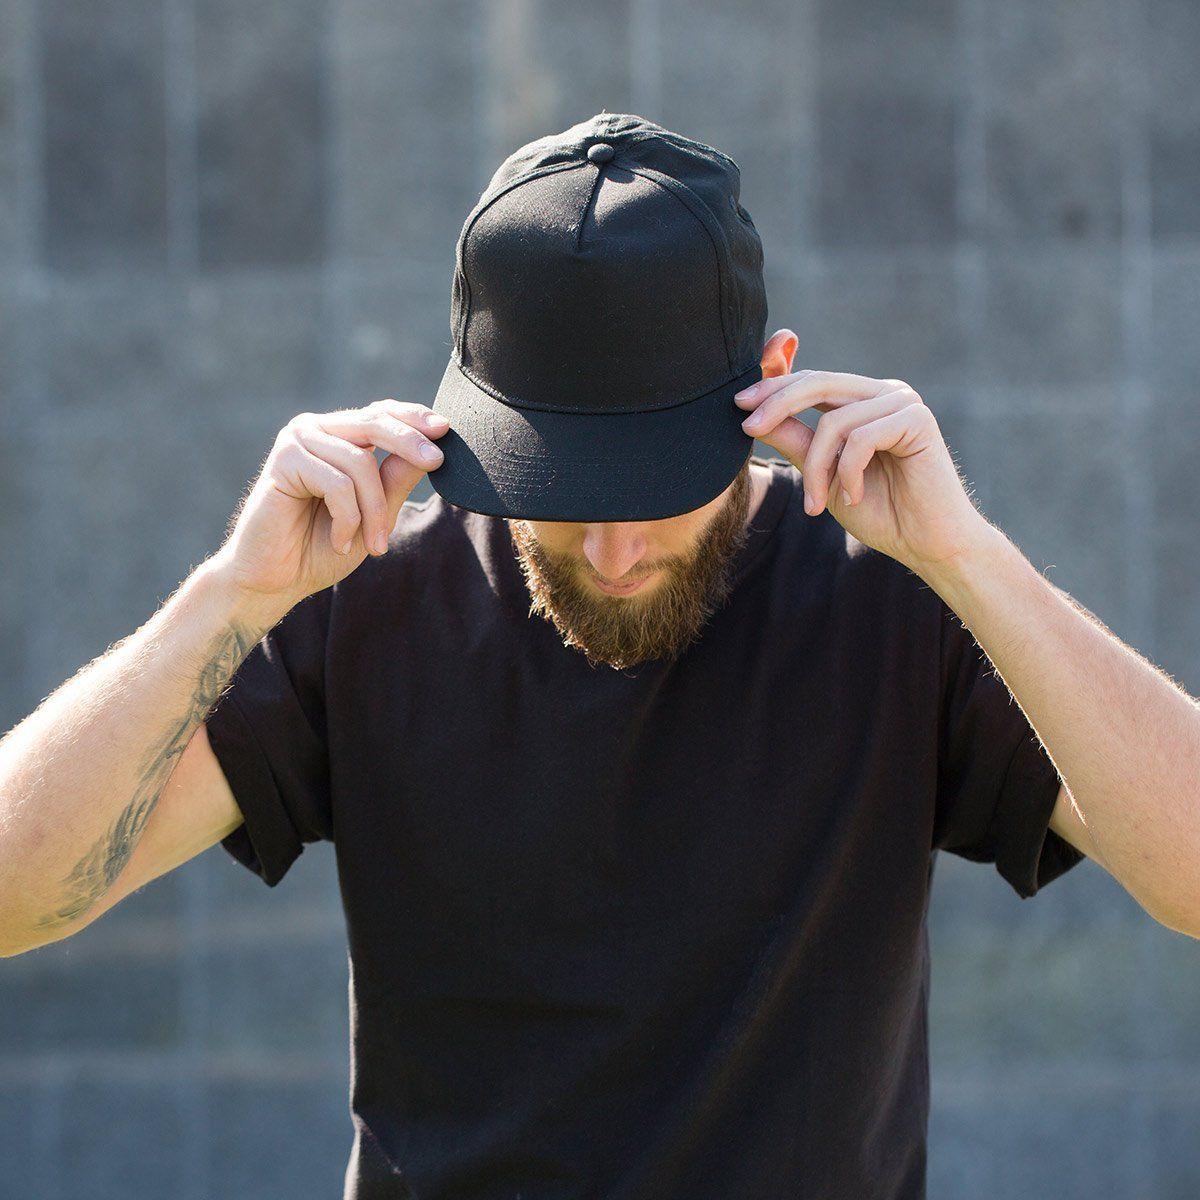 349f14e0850c7ea28acbc19a5fa9c683 - How To Get Rid Of Sweat Smell On Hats